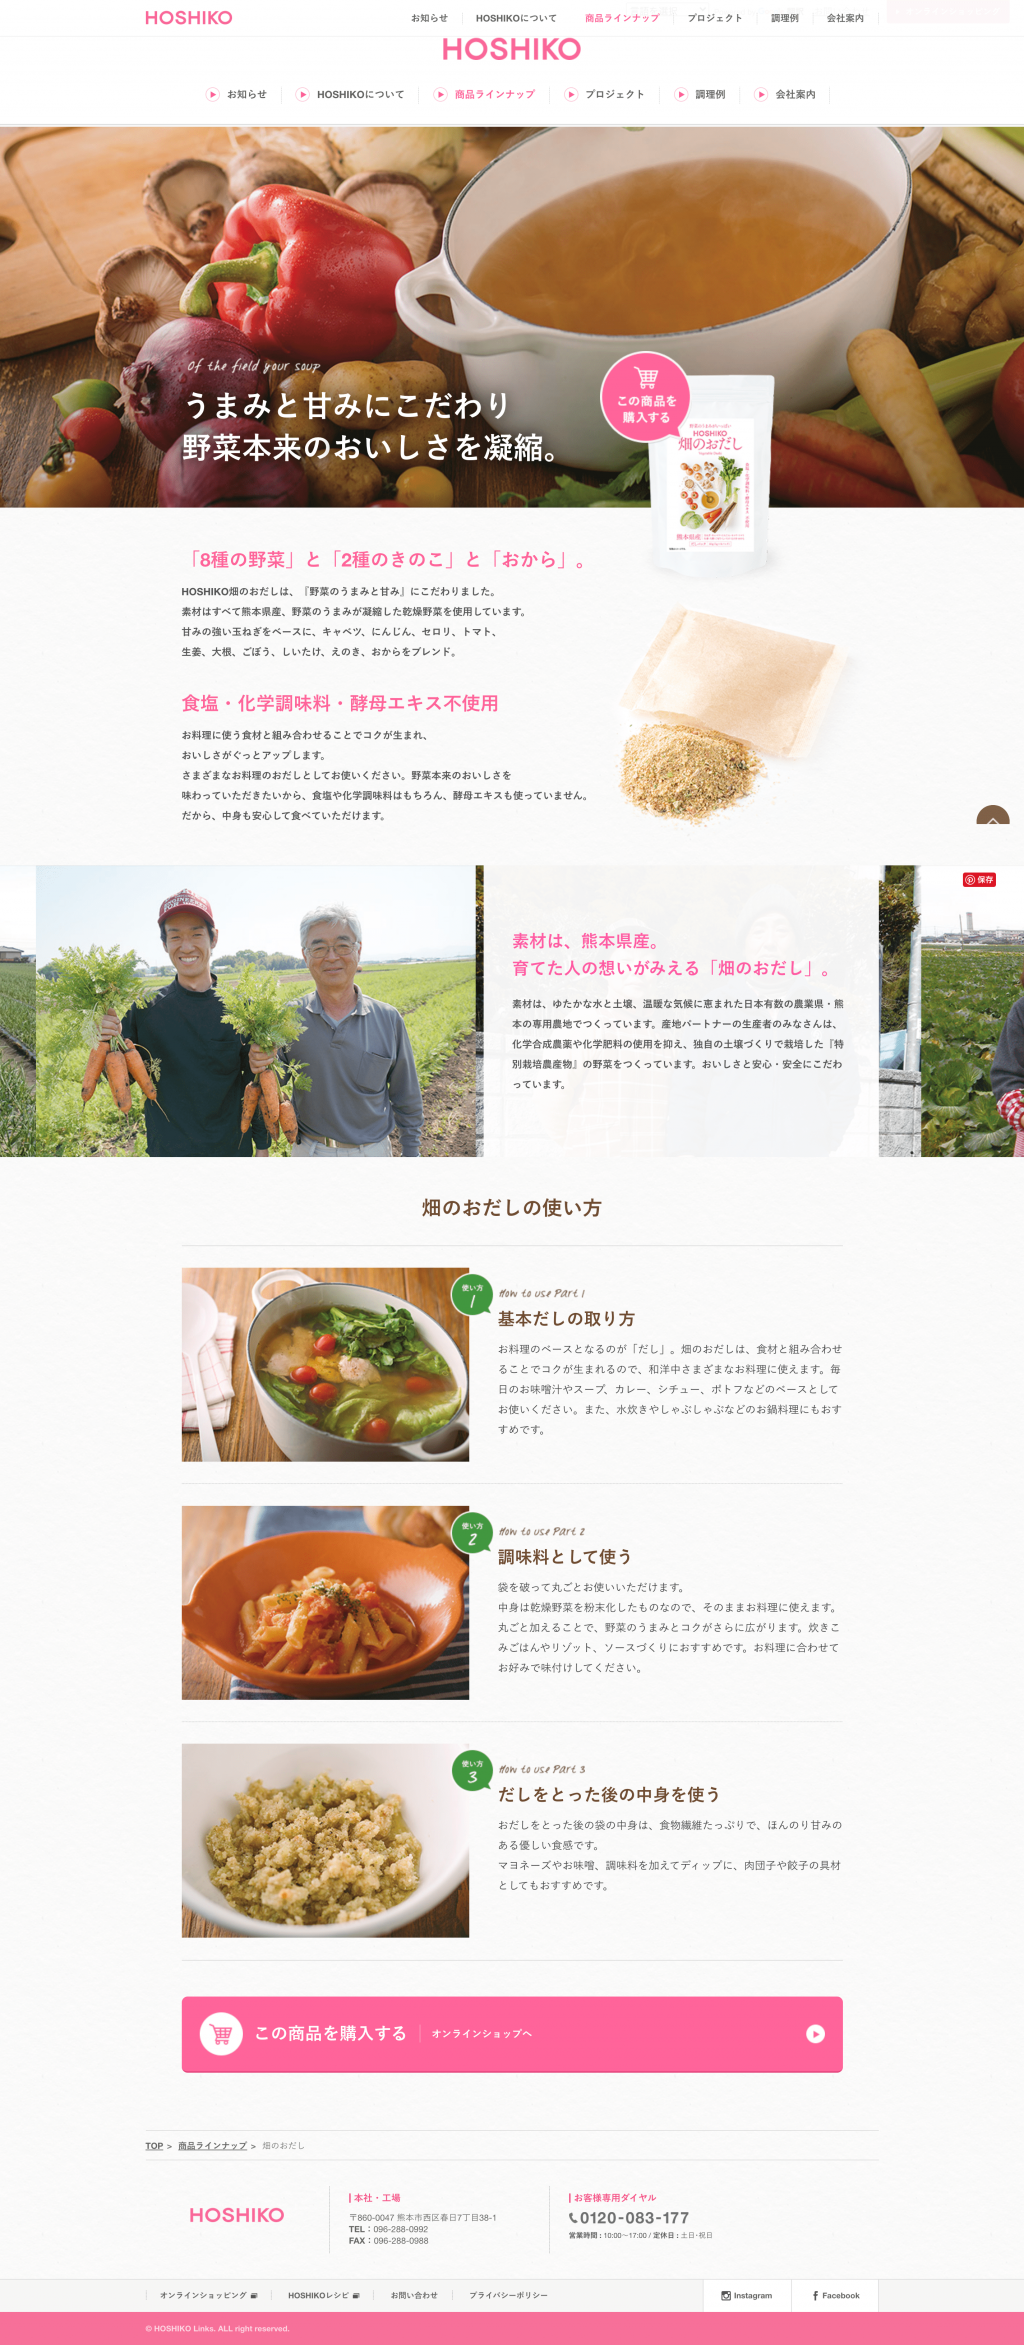 HOSHIKOサイトのパソコン表示